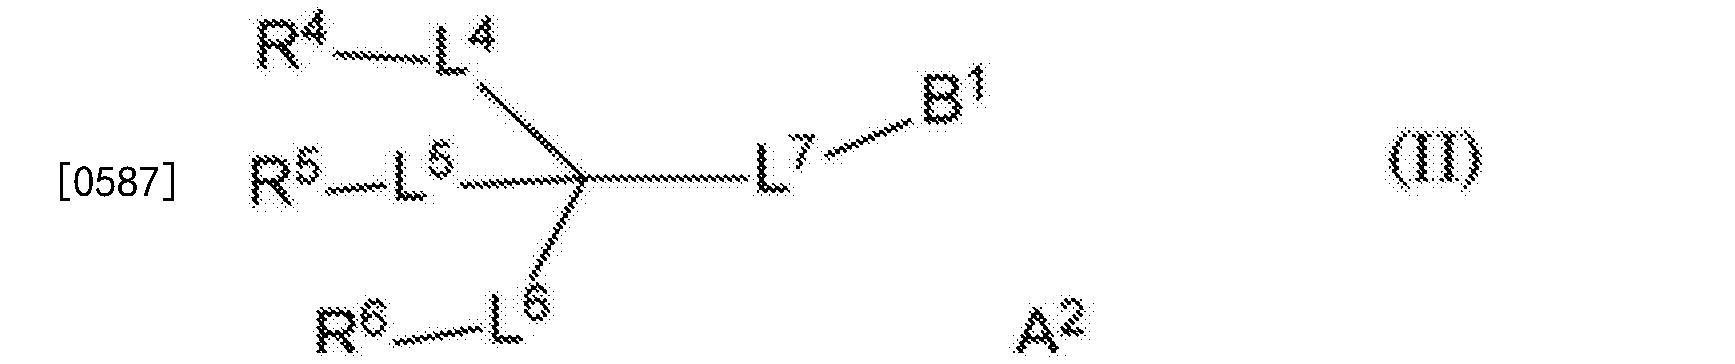 Figure CN107427531AD00782